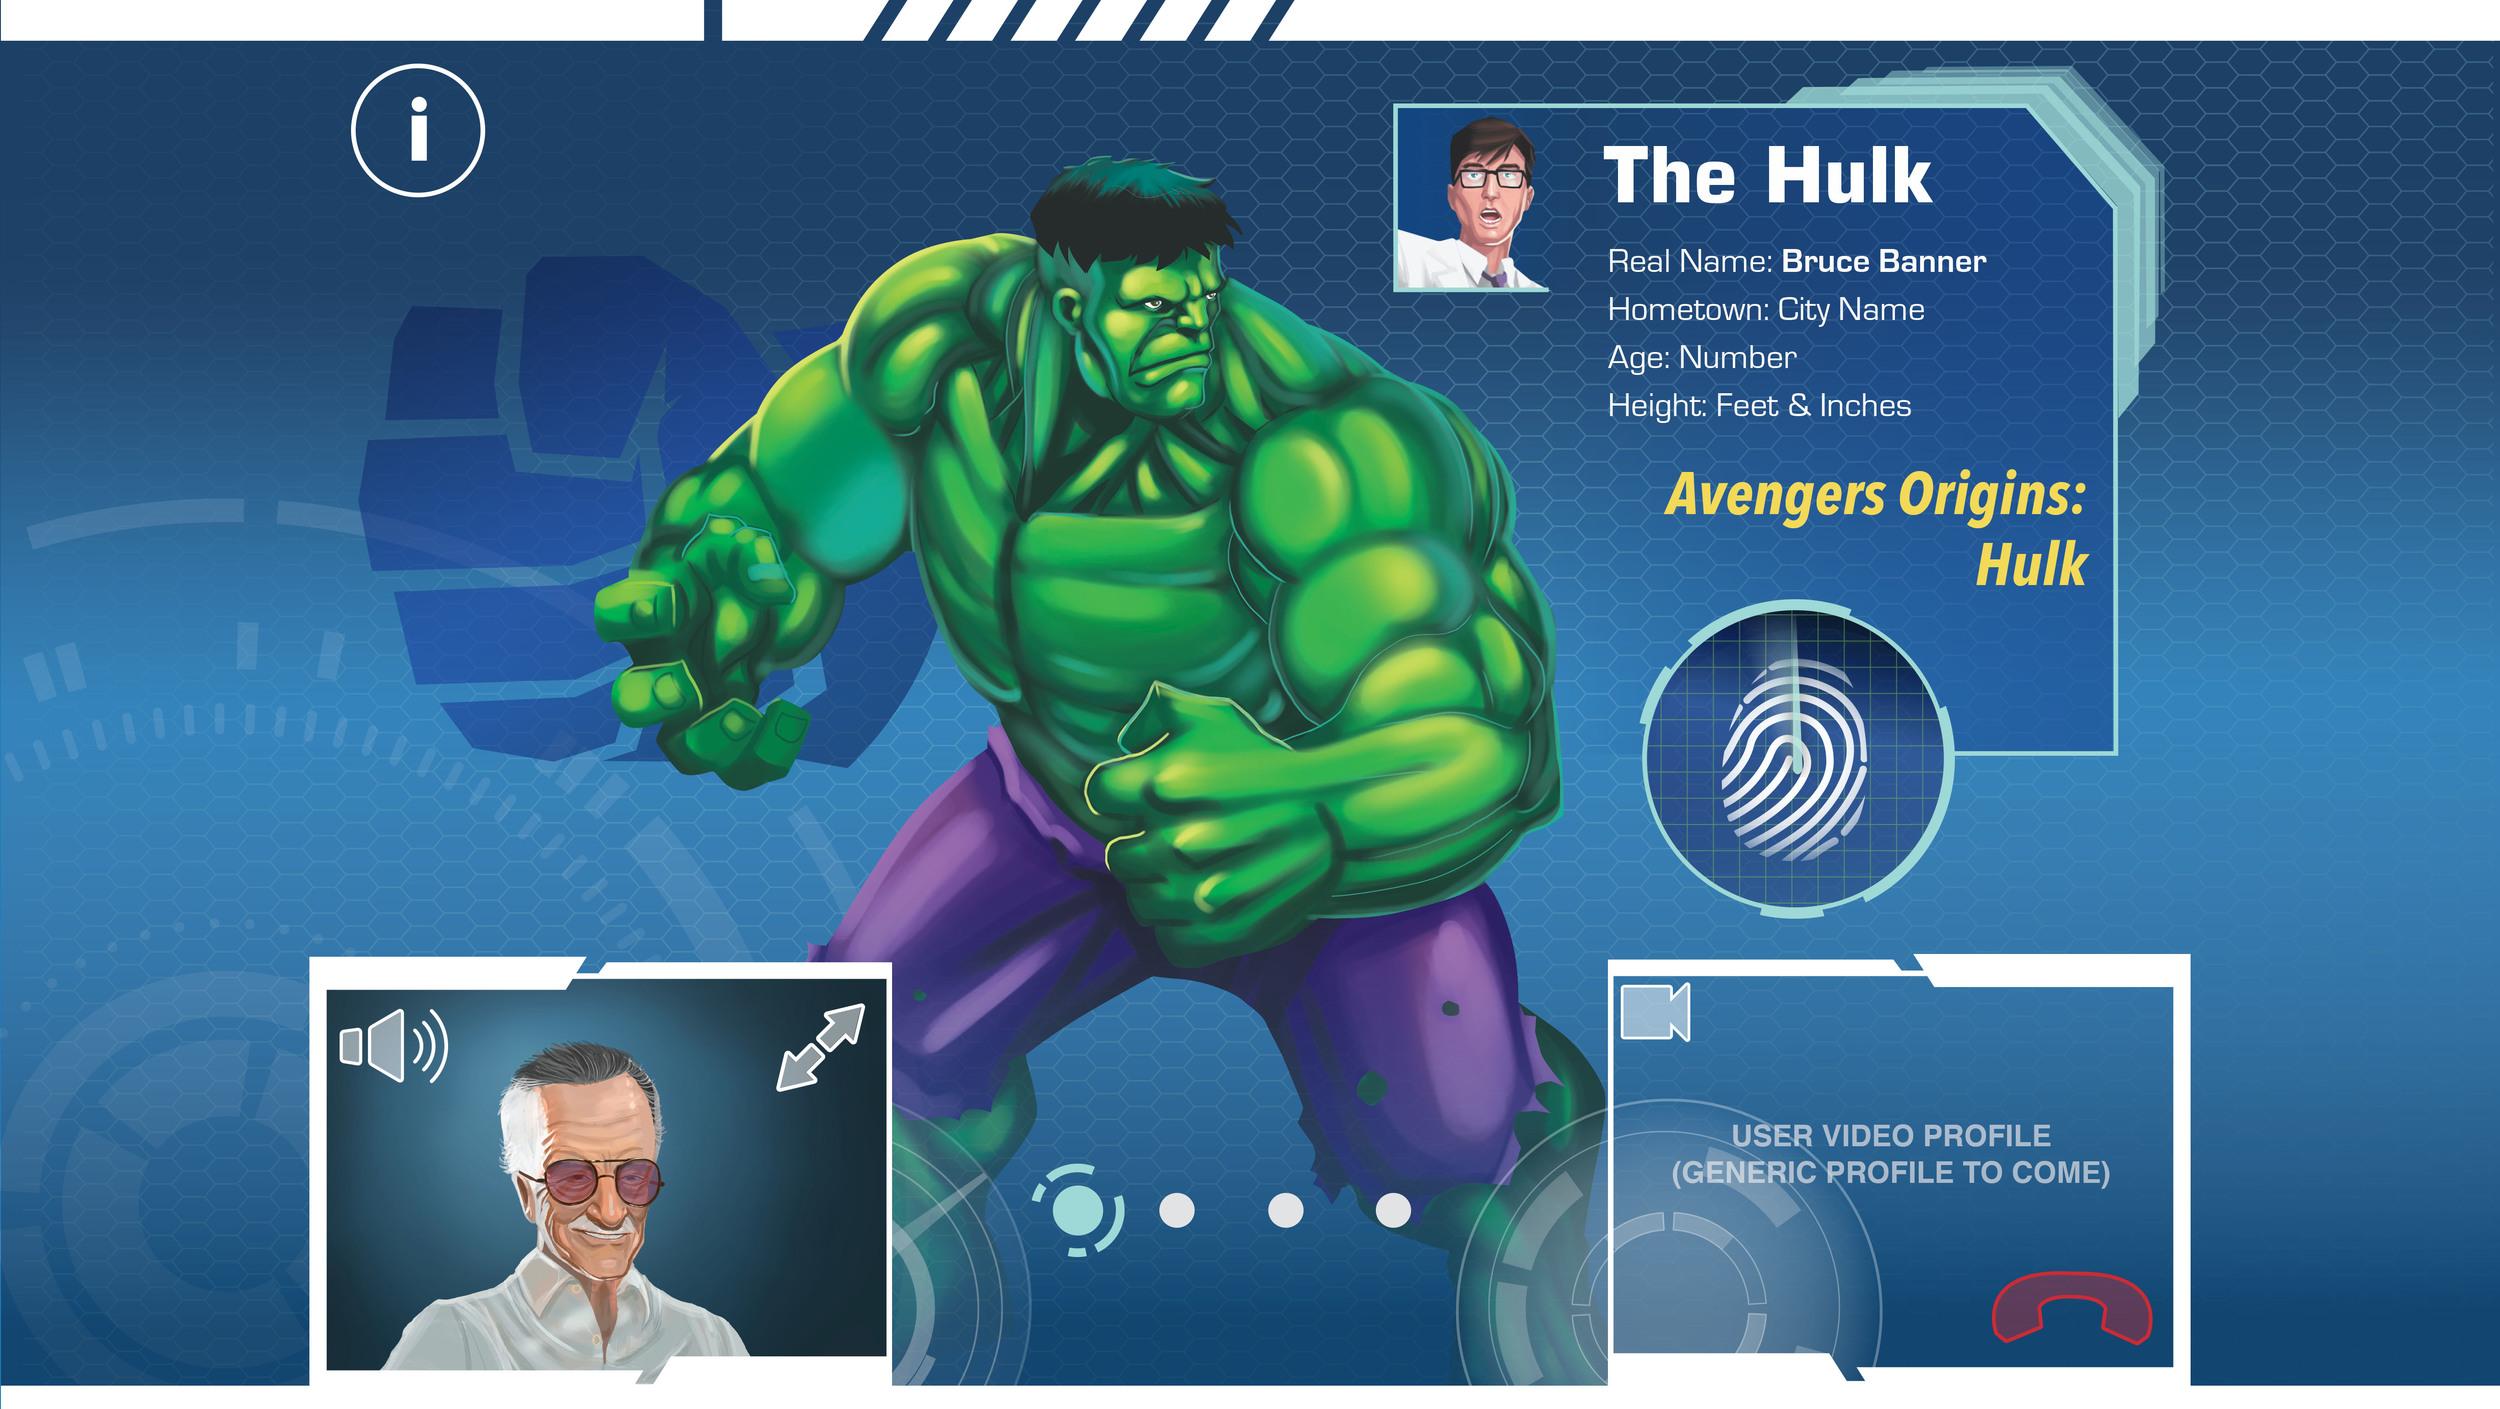 MCA-UI 7-18 (Large)_0012_The Hulk Declassified.jpg